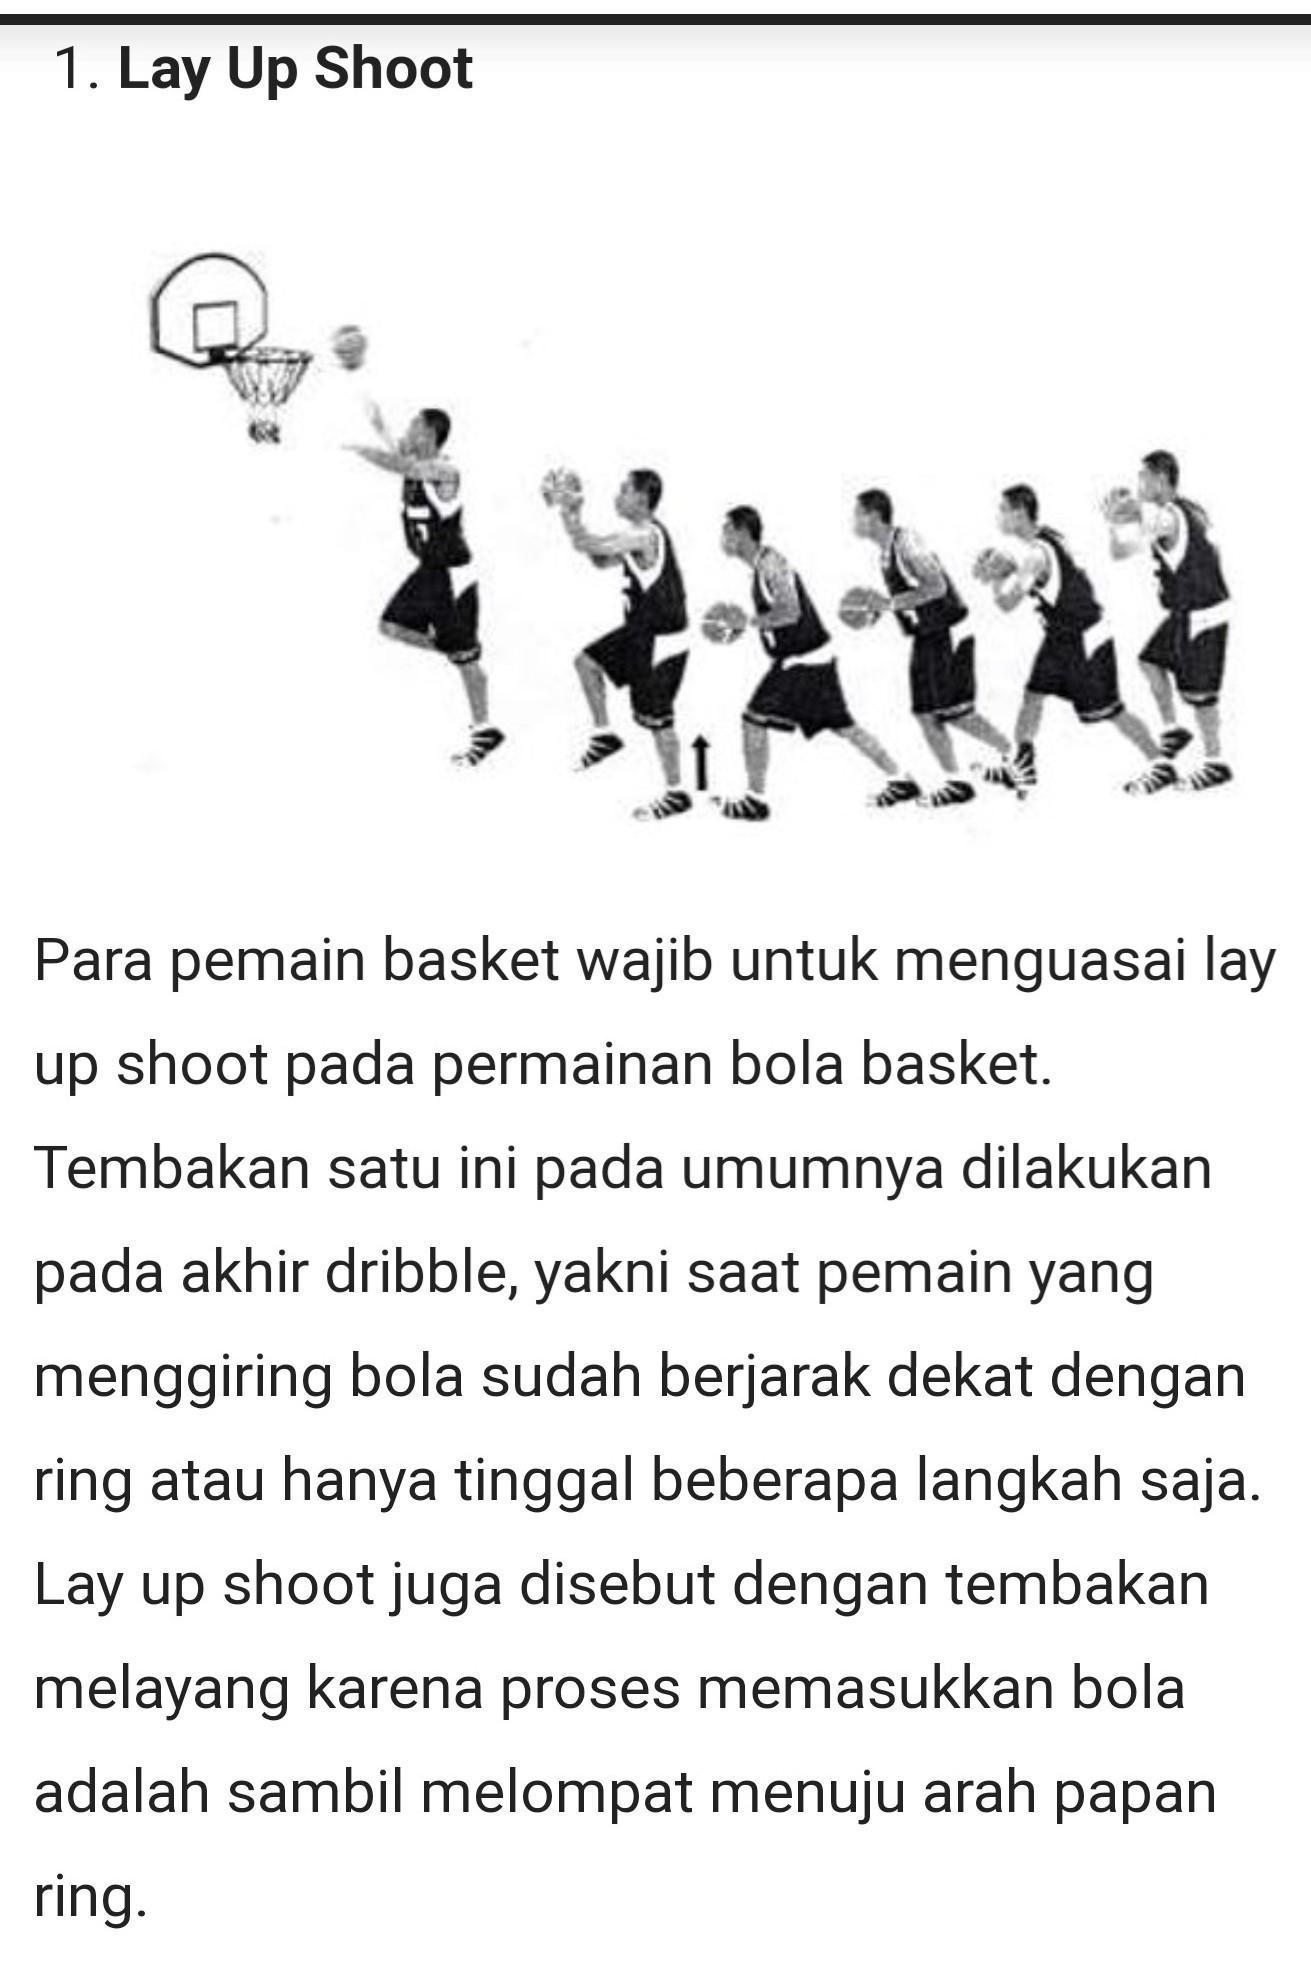 Lay Up Shoot Dalam Bola Basket : shoot, dalam, basket, Tembakan, Basket, Sambil, Melompat, Dengan, Posisi, Dekat, Shoot?(plis, Brainly.co.id